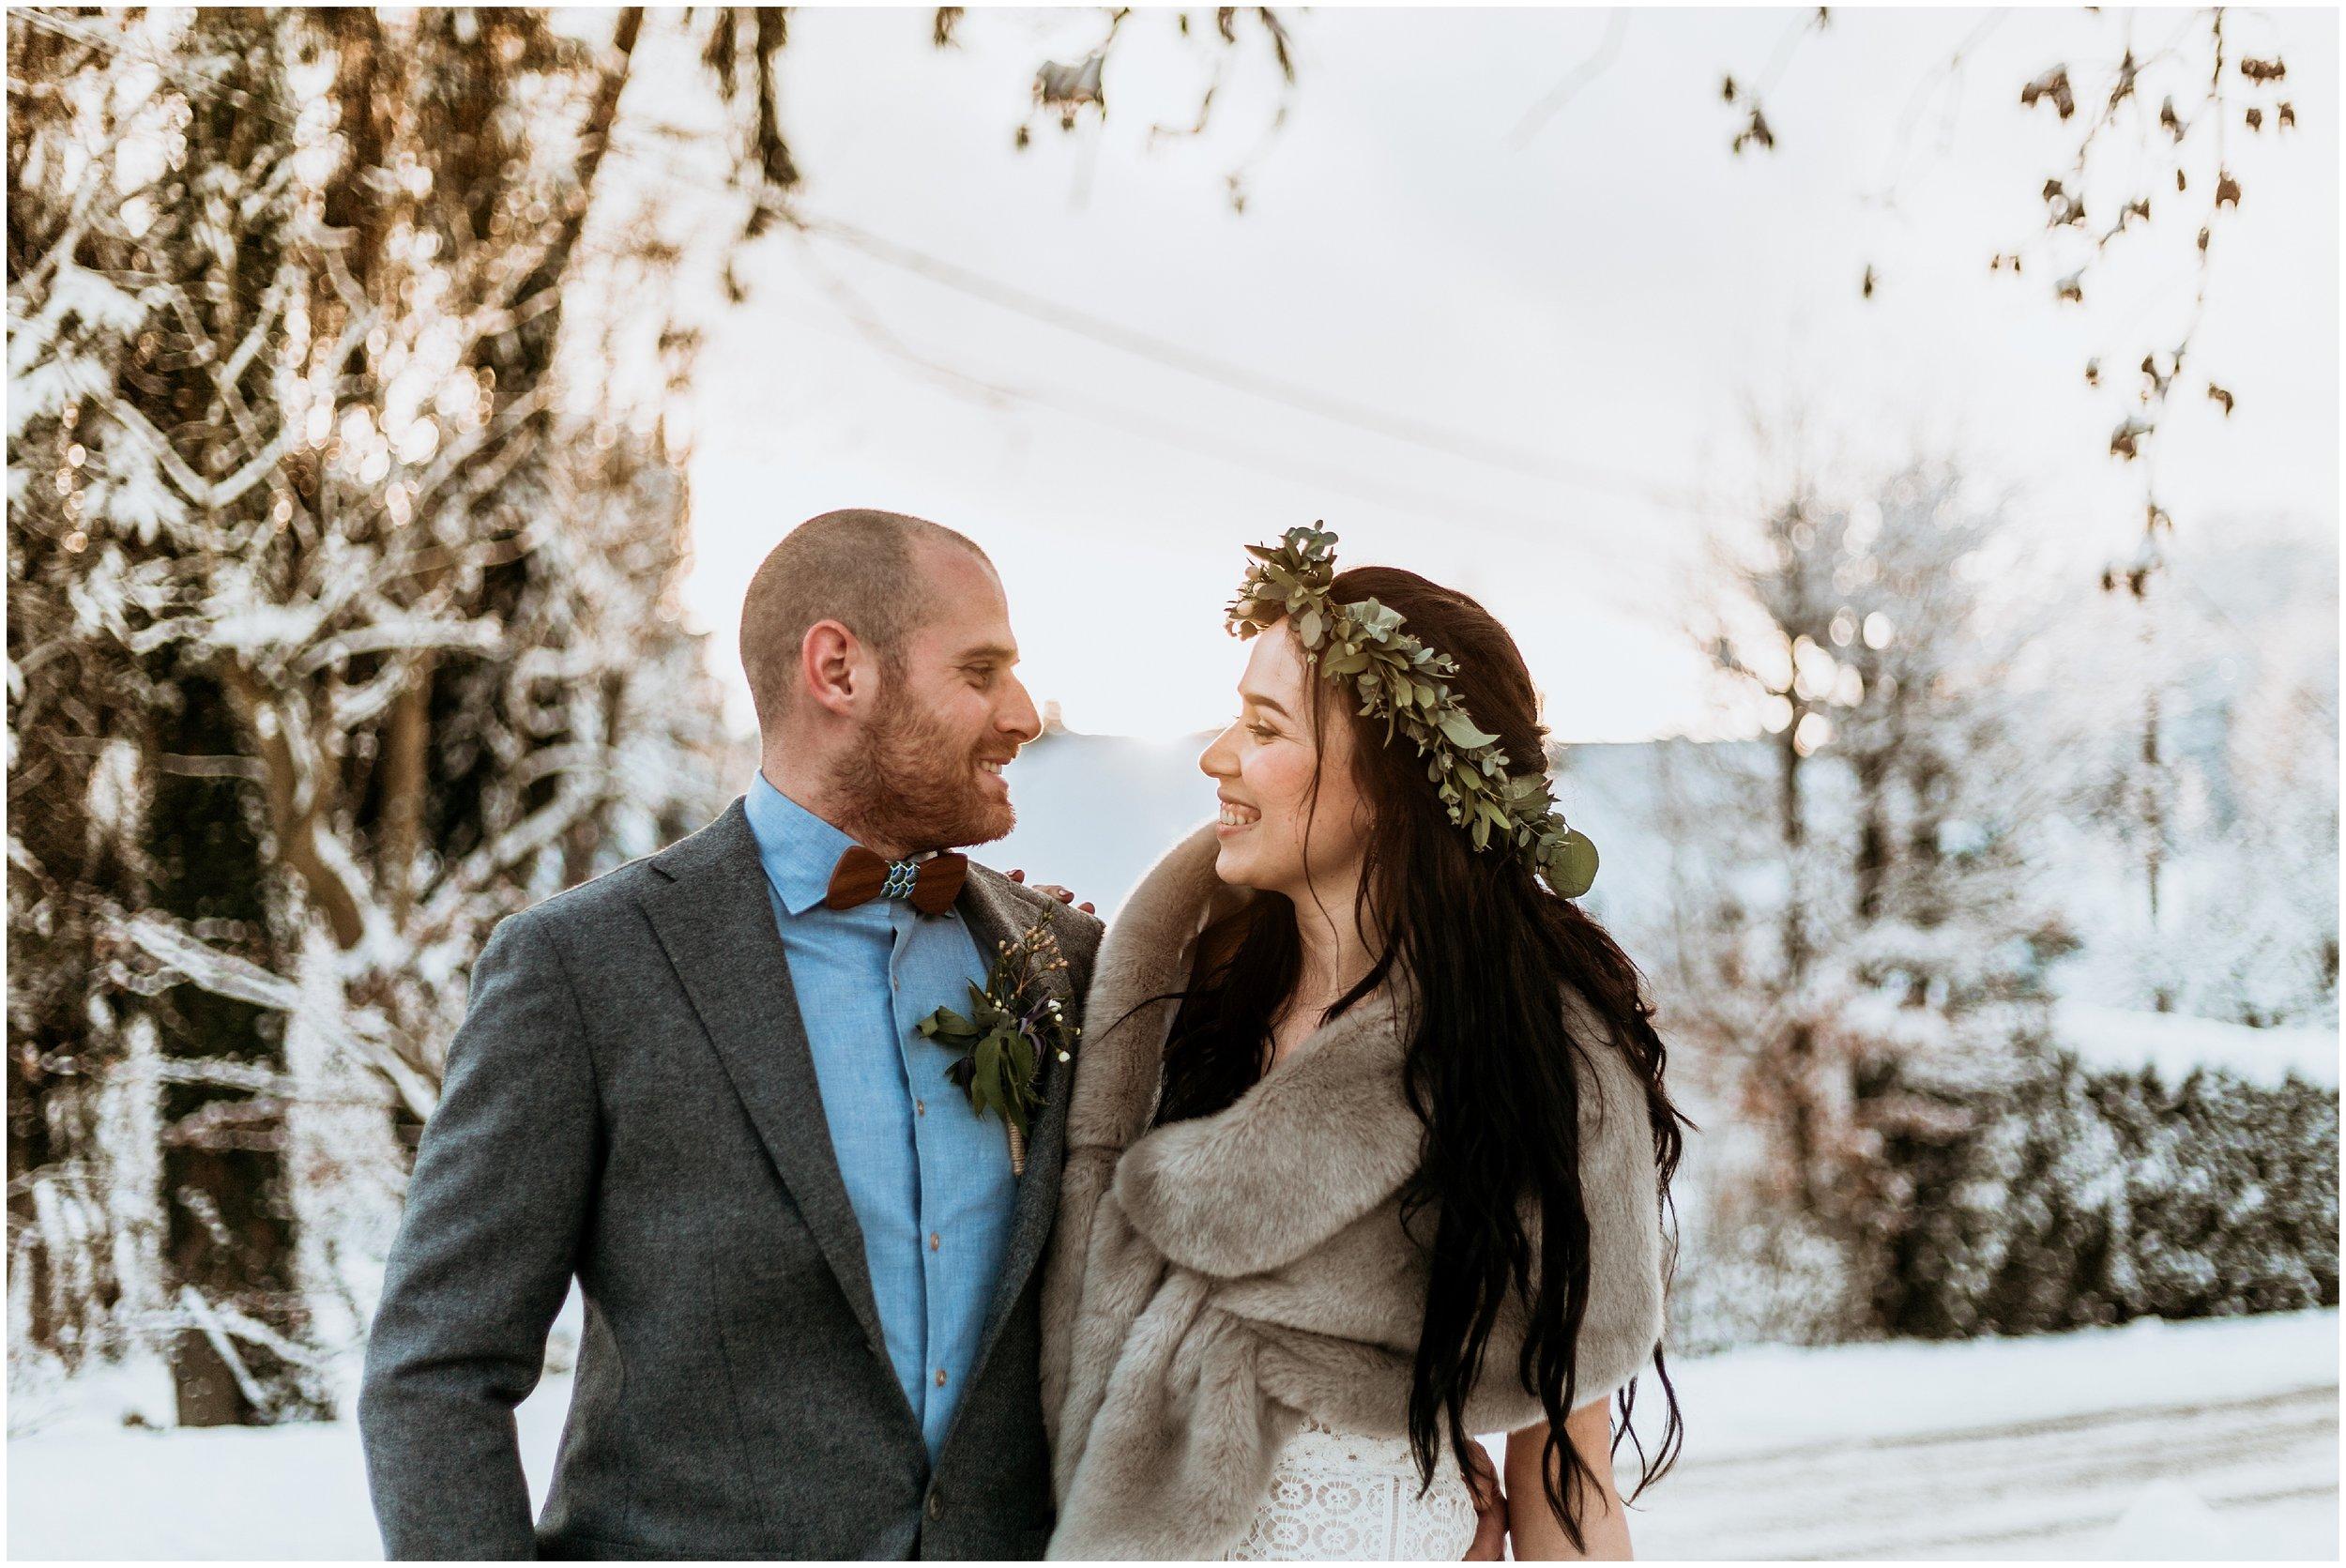 huwelijksfotografie-jana-joeri-ardennen-sechery_0029.jpg